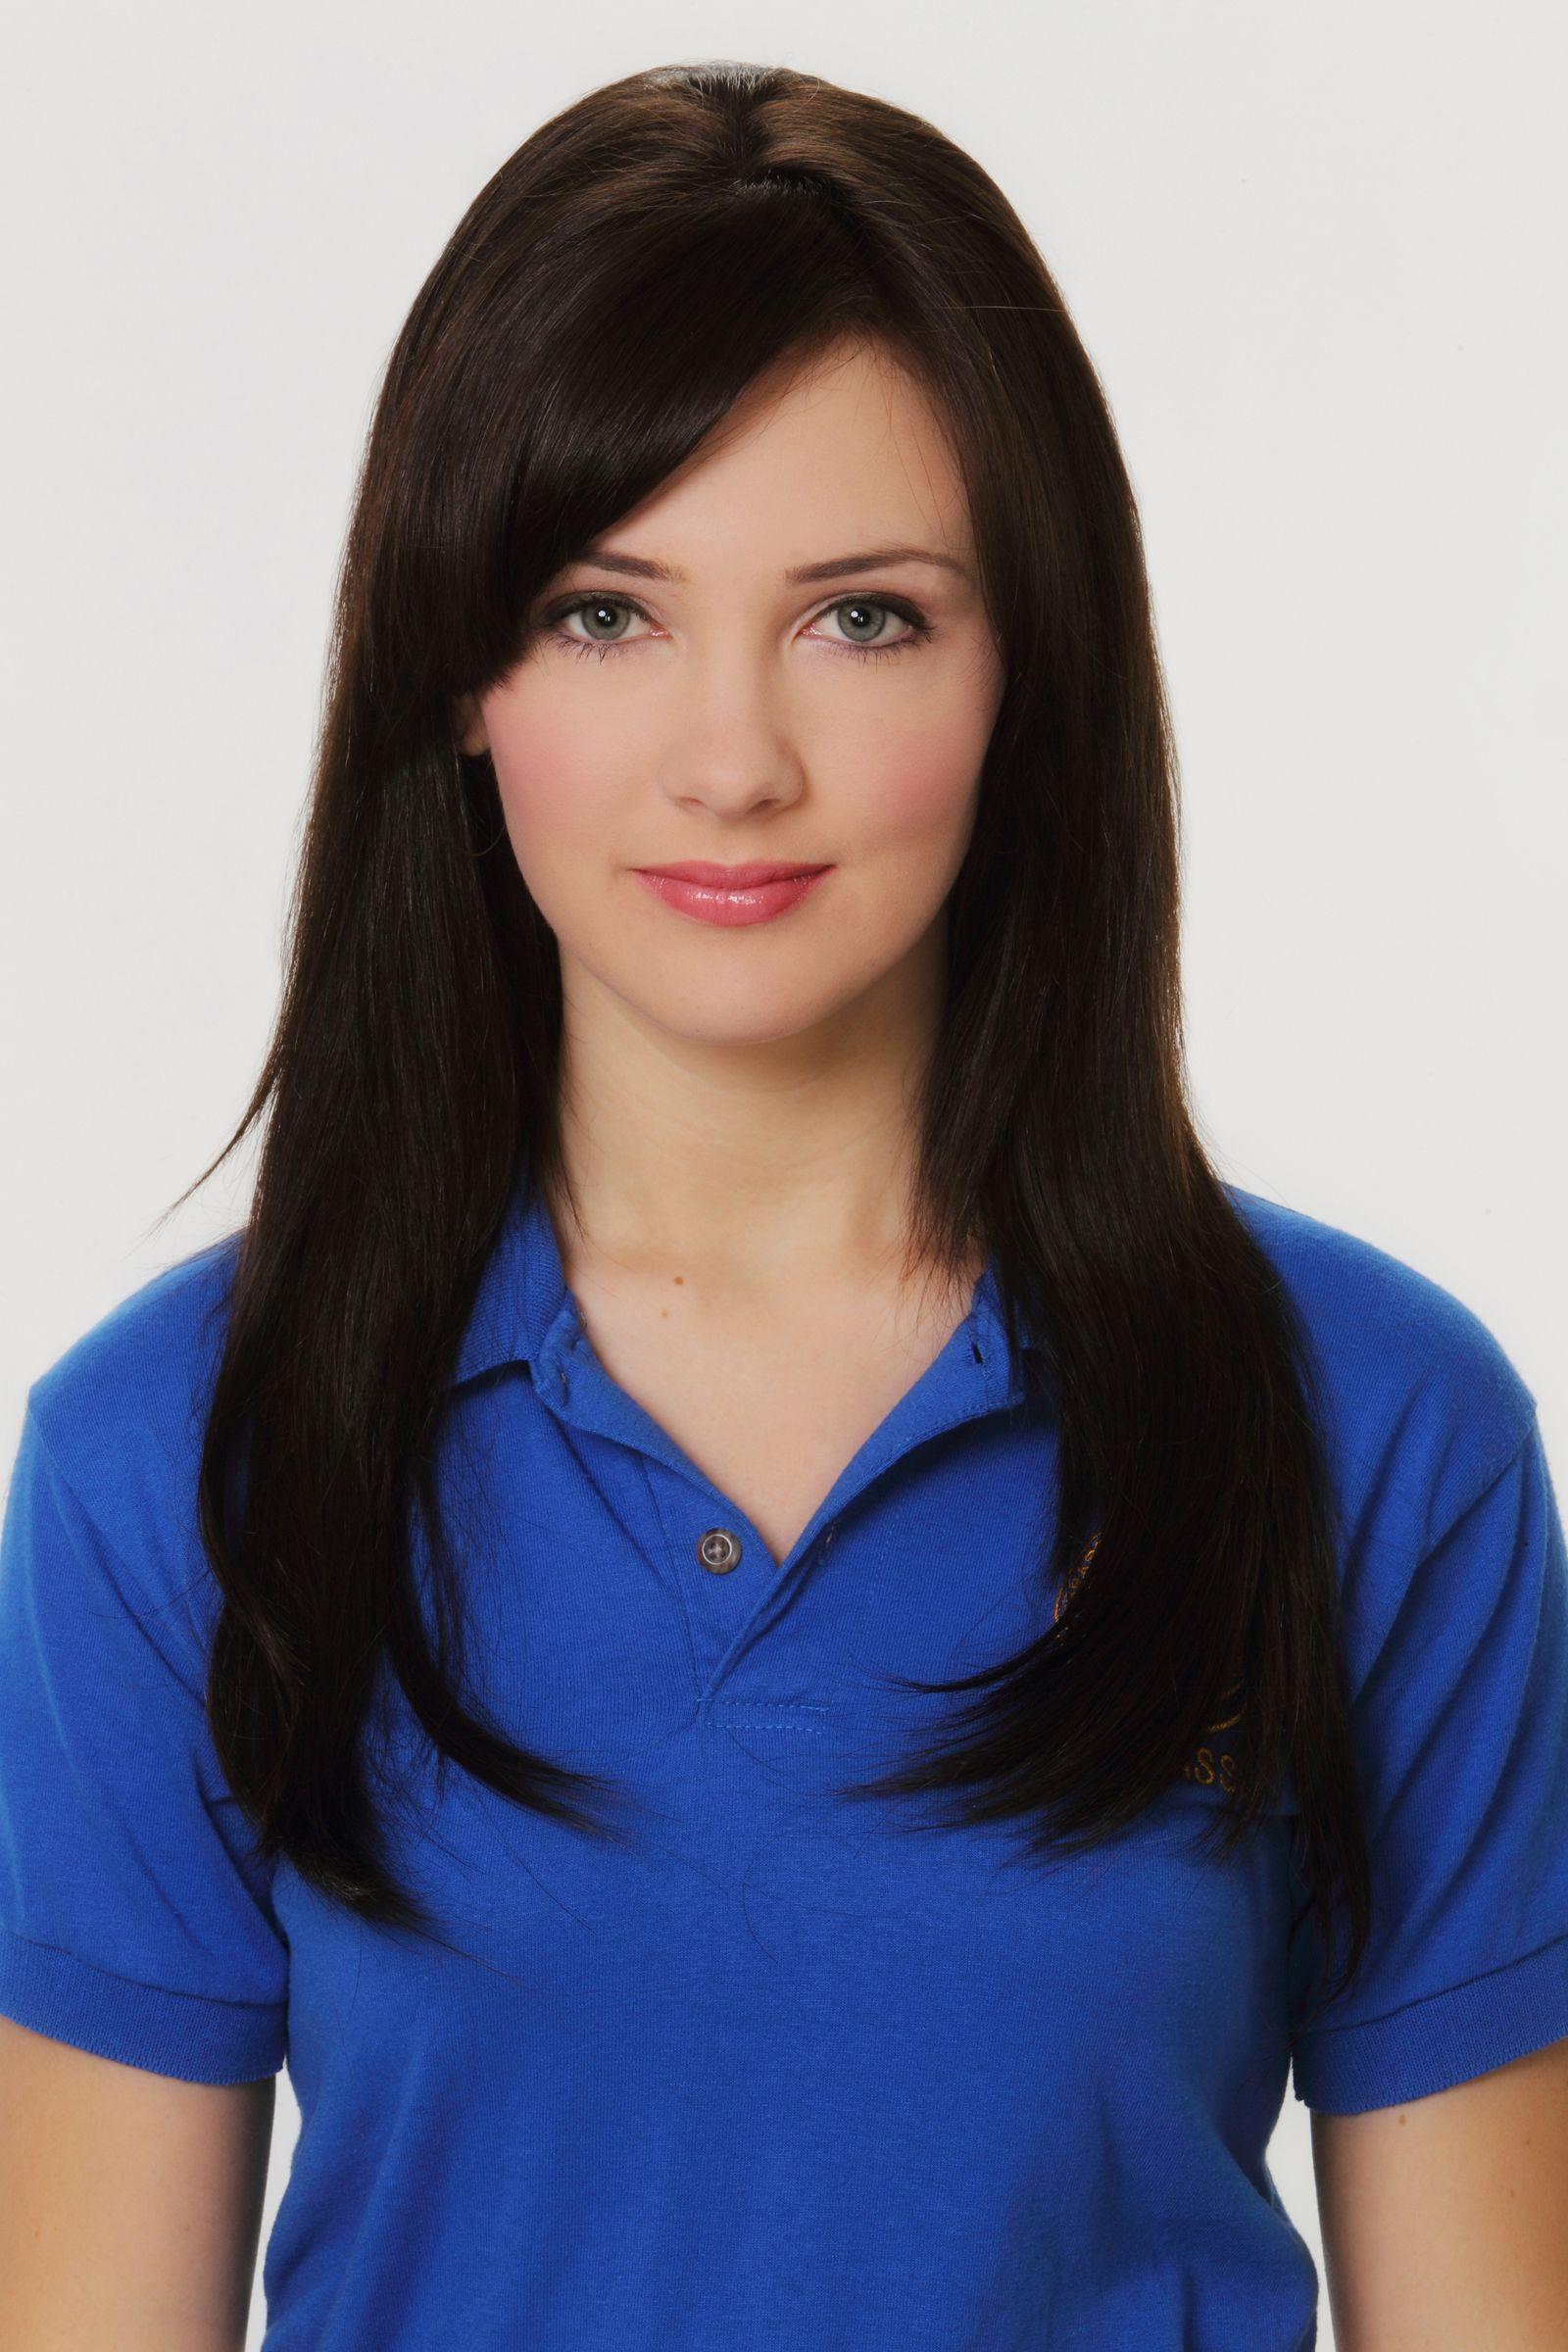 Anya Macpherson Degrassi Degrassi The Next Generation Samantha